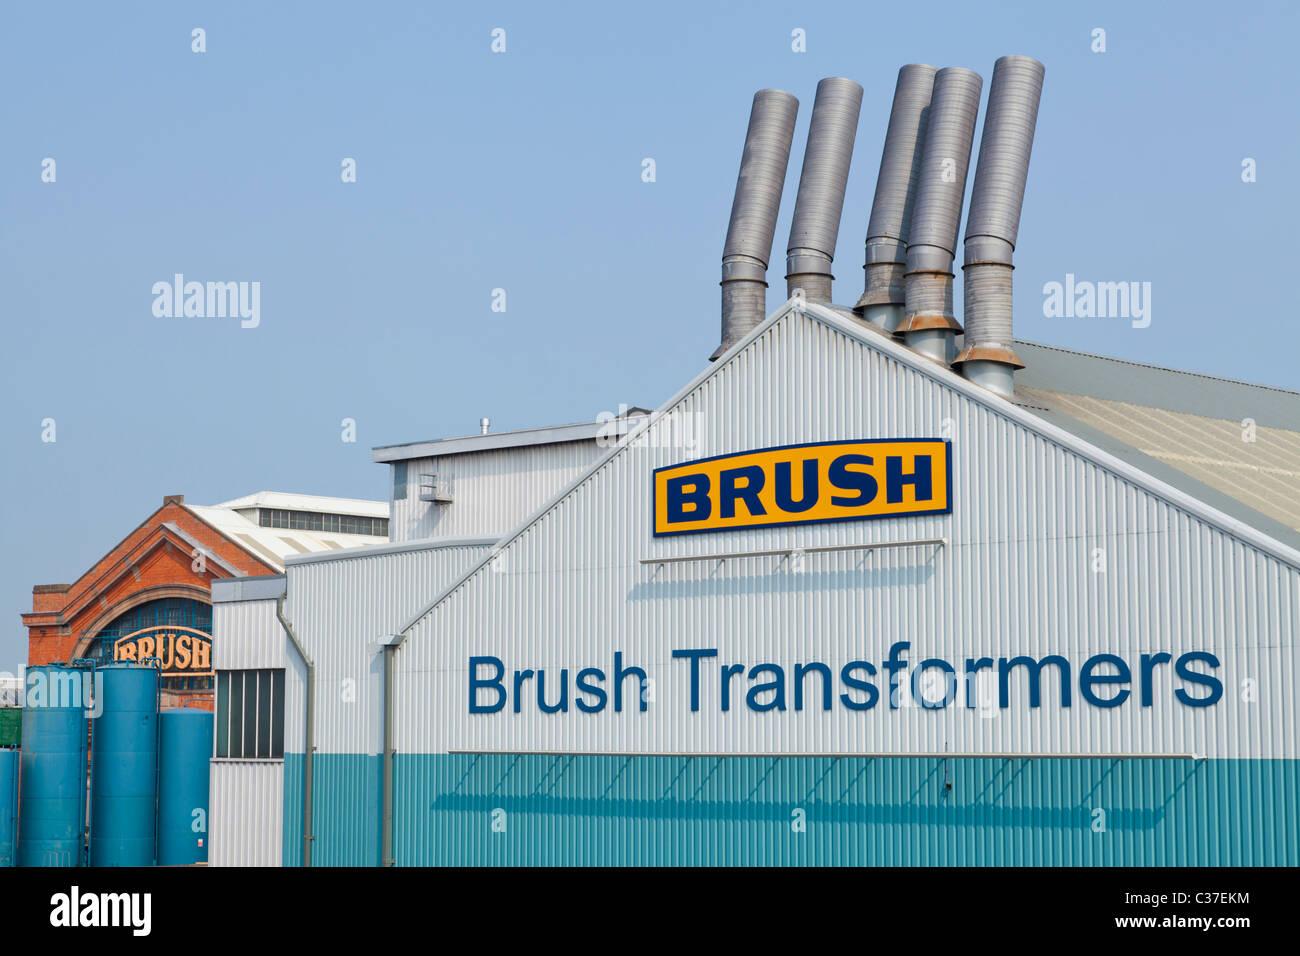 Trasformatori di Brush Company Loughborough Leicestershire Inghilterra GB UK EU Europe Immagini Stock